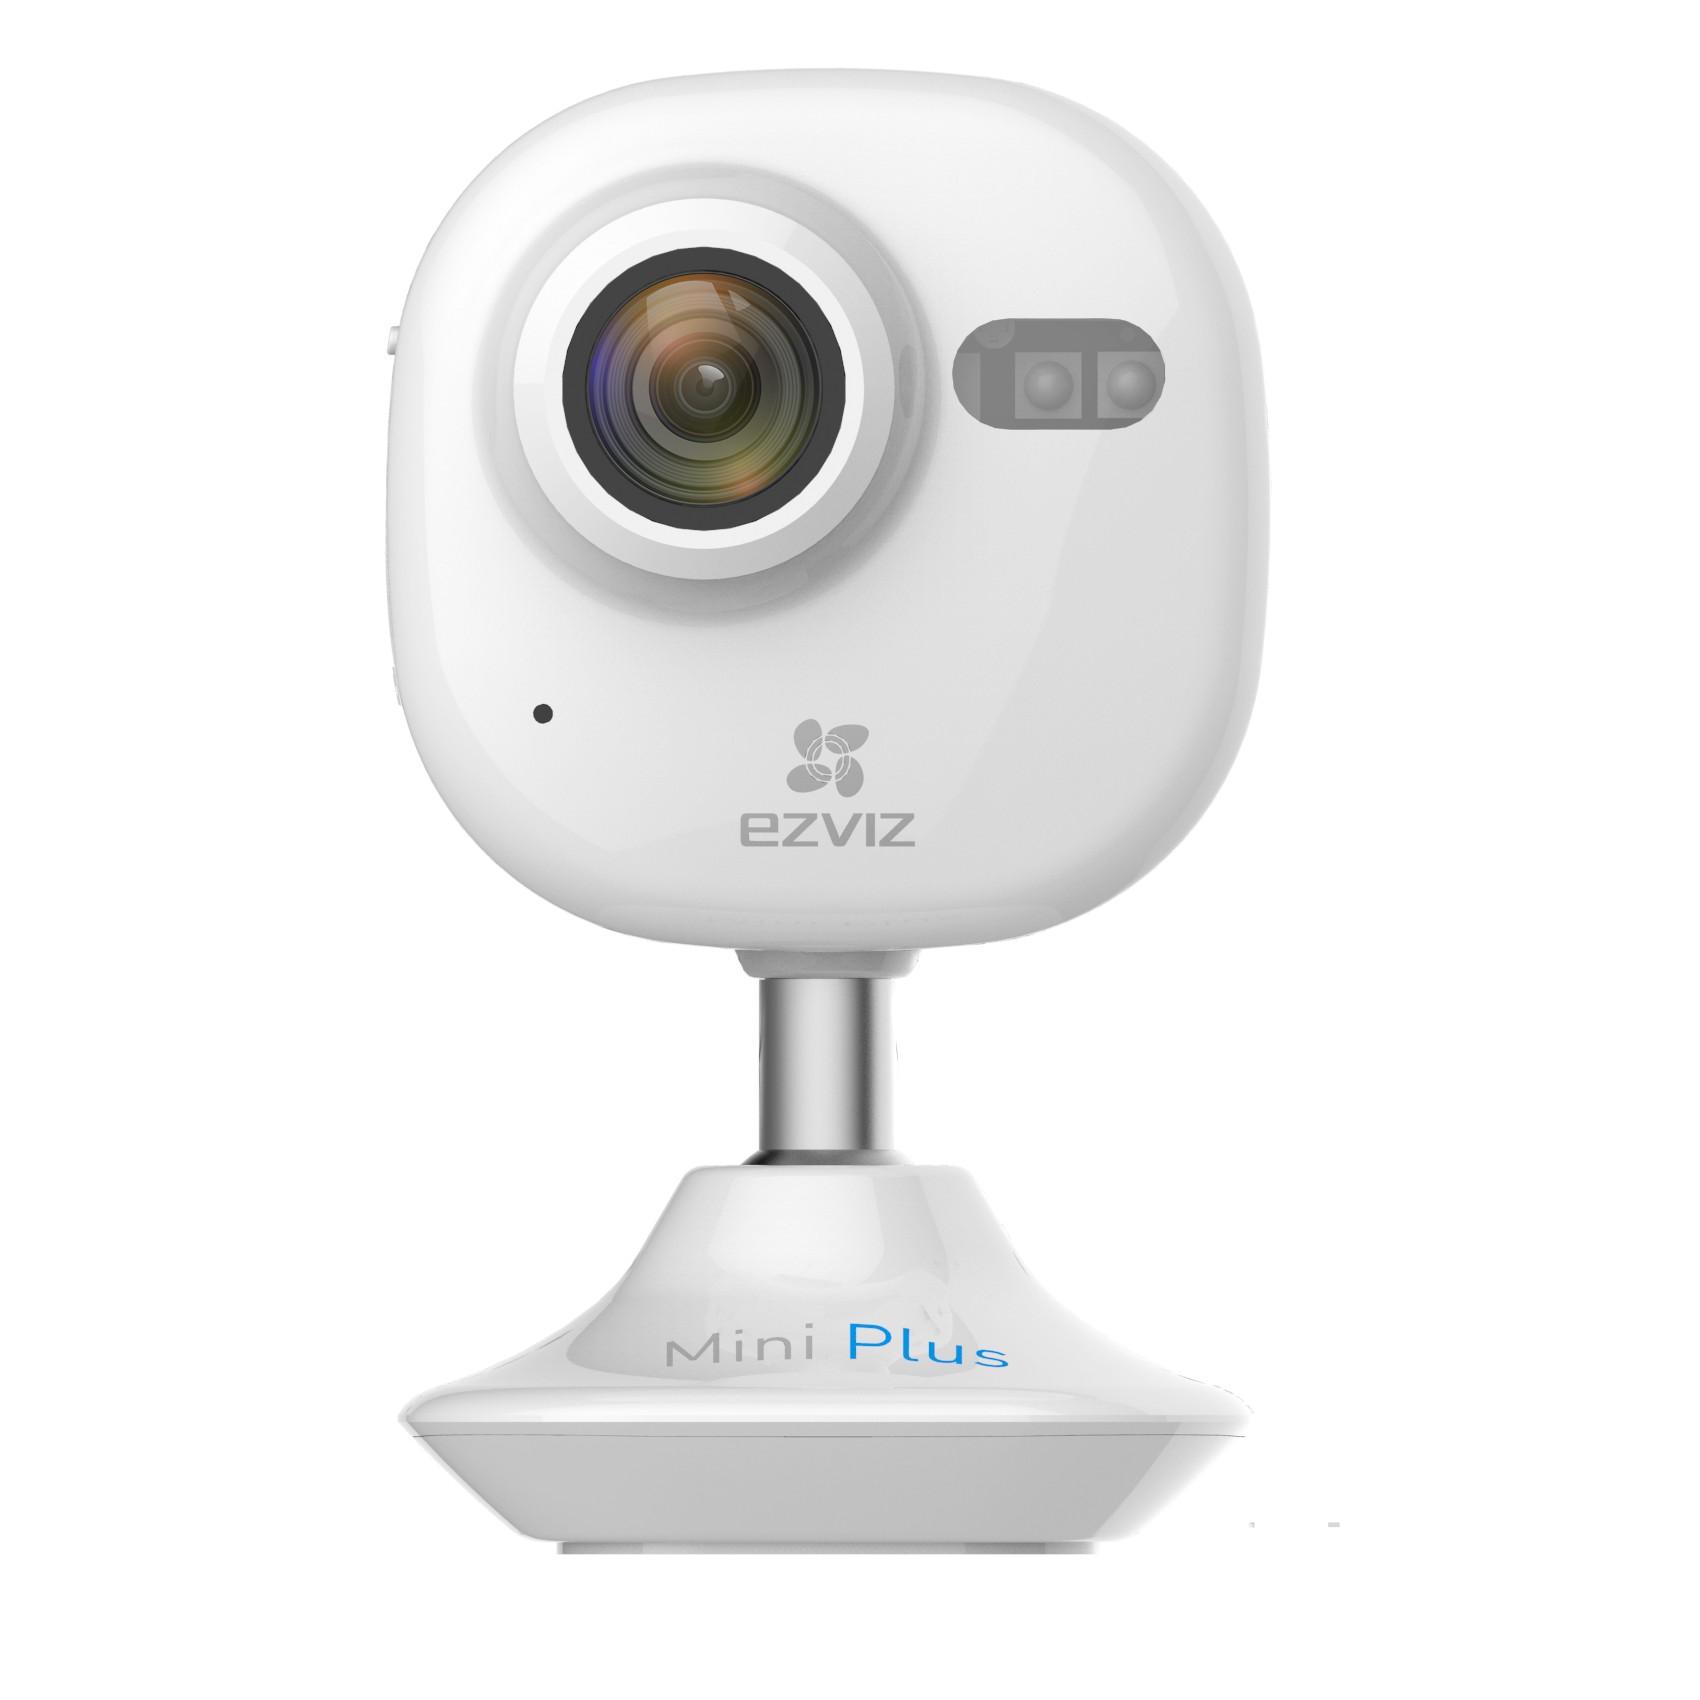 EZVIZ Mini Plus — Многофункциональная Full HD камера